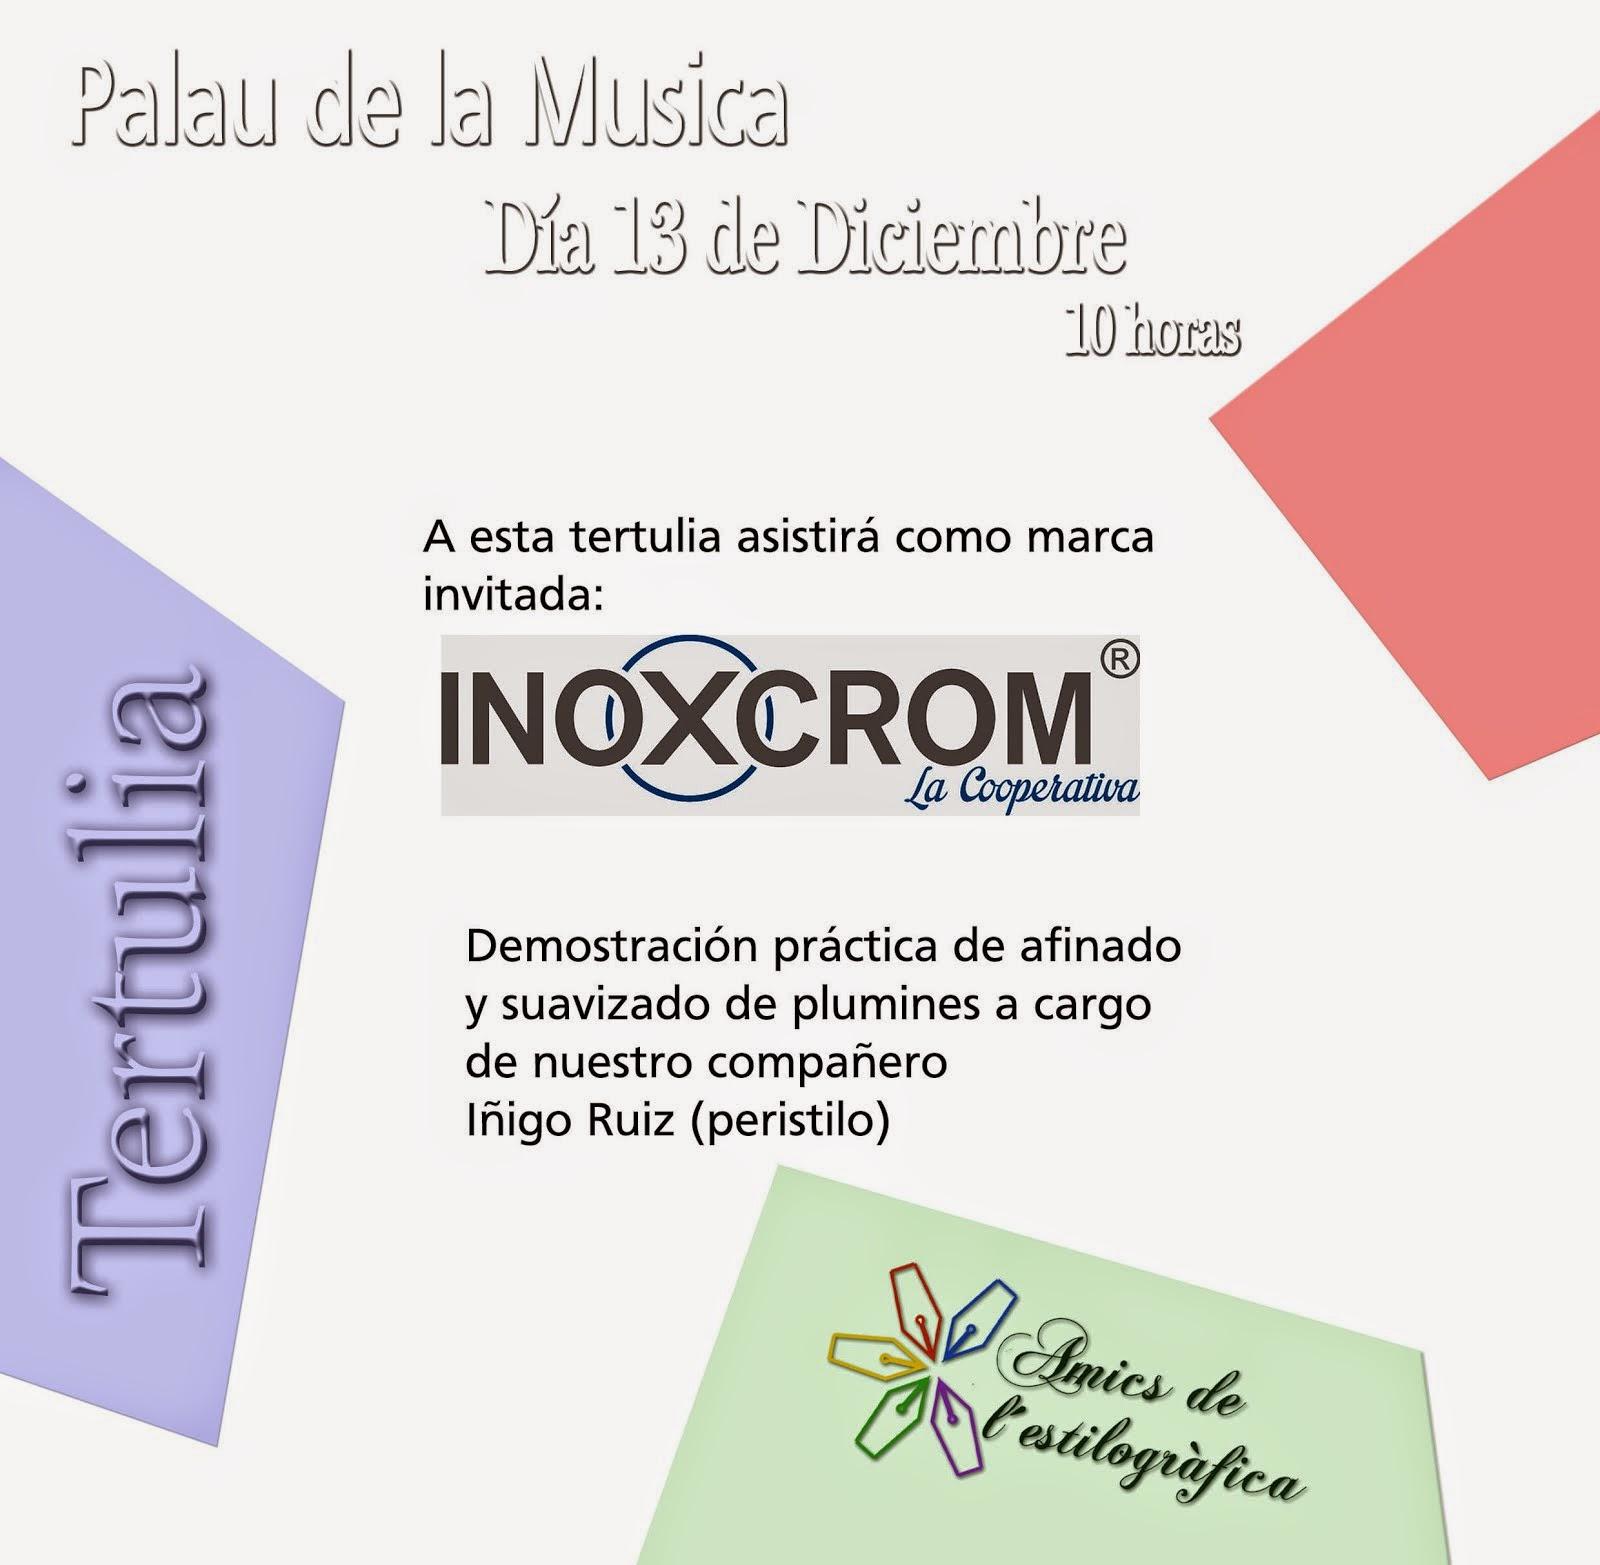 27 TERTULIA 13 DE DICIEMBRE 2014 (INOXCROM)